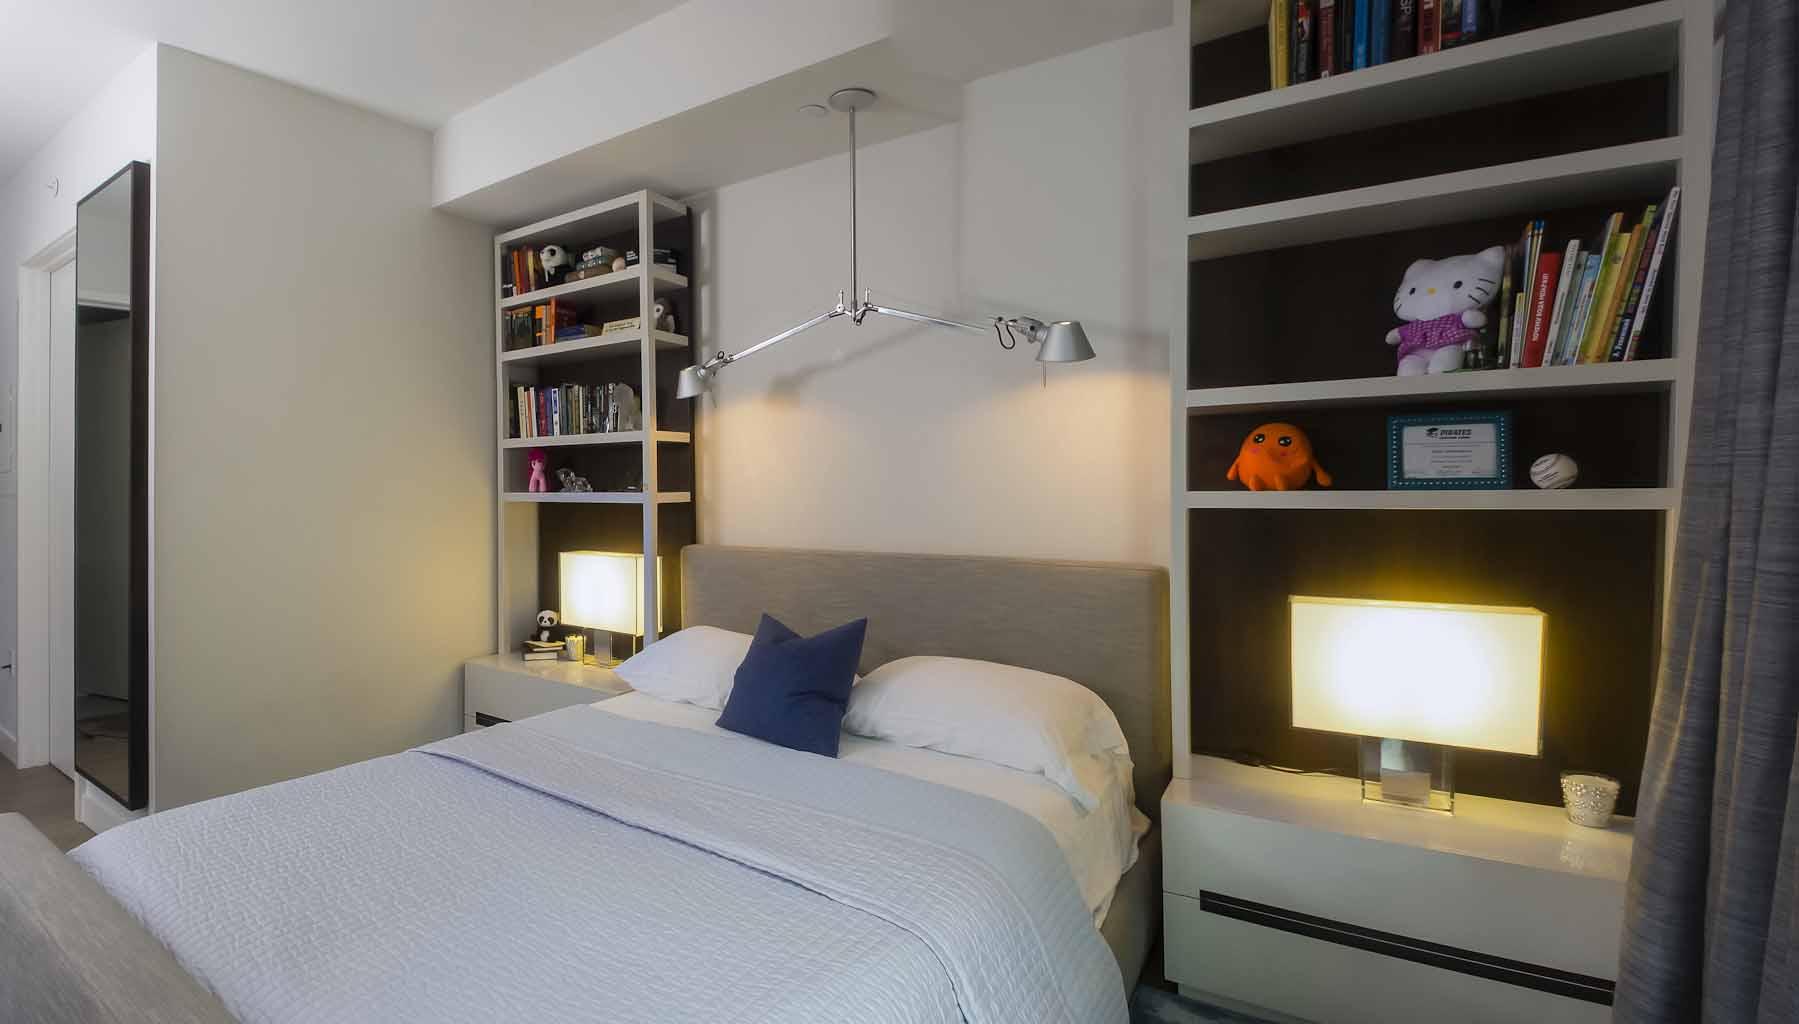 Bedroom 2 panorama 201web.JPG